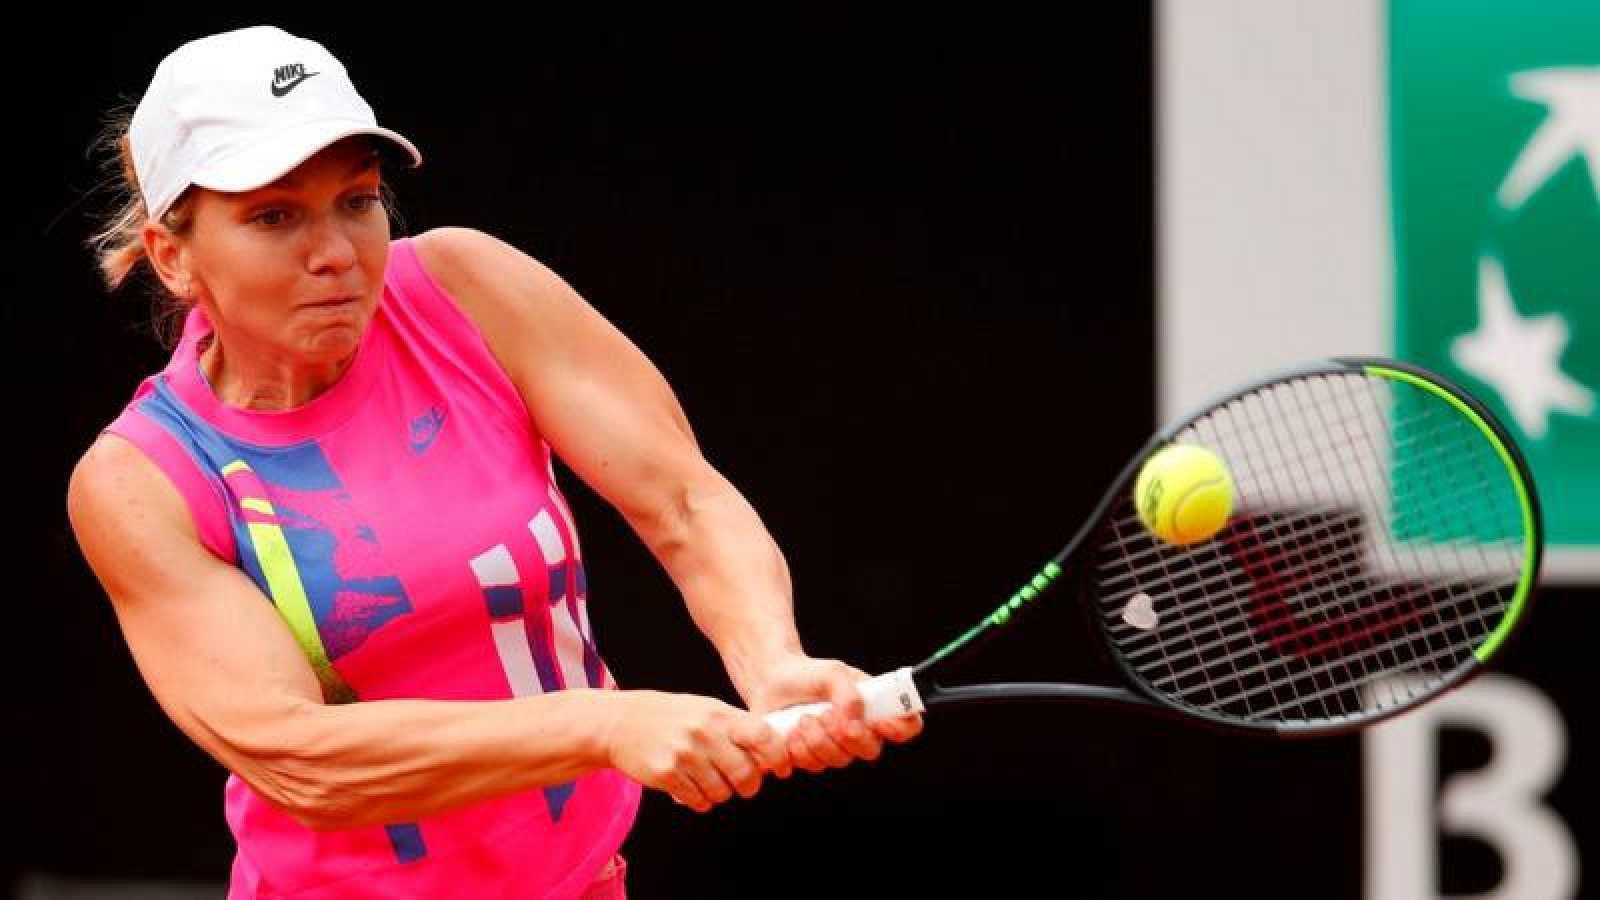 La tenista rumana Simona Halep durante la final del Abierto de Roma 2020.